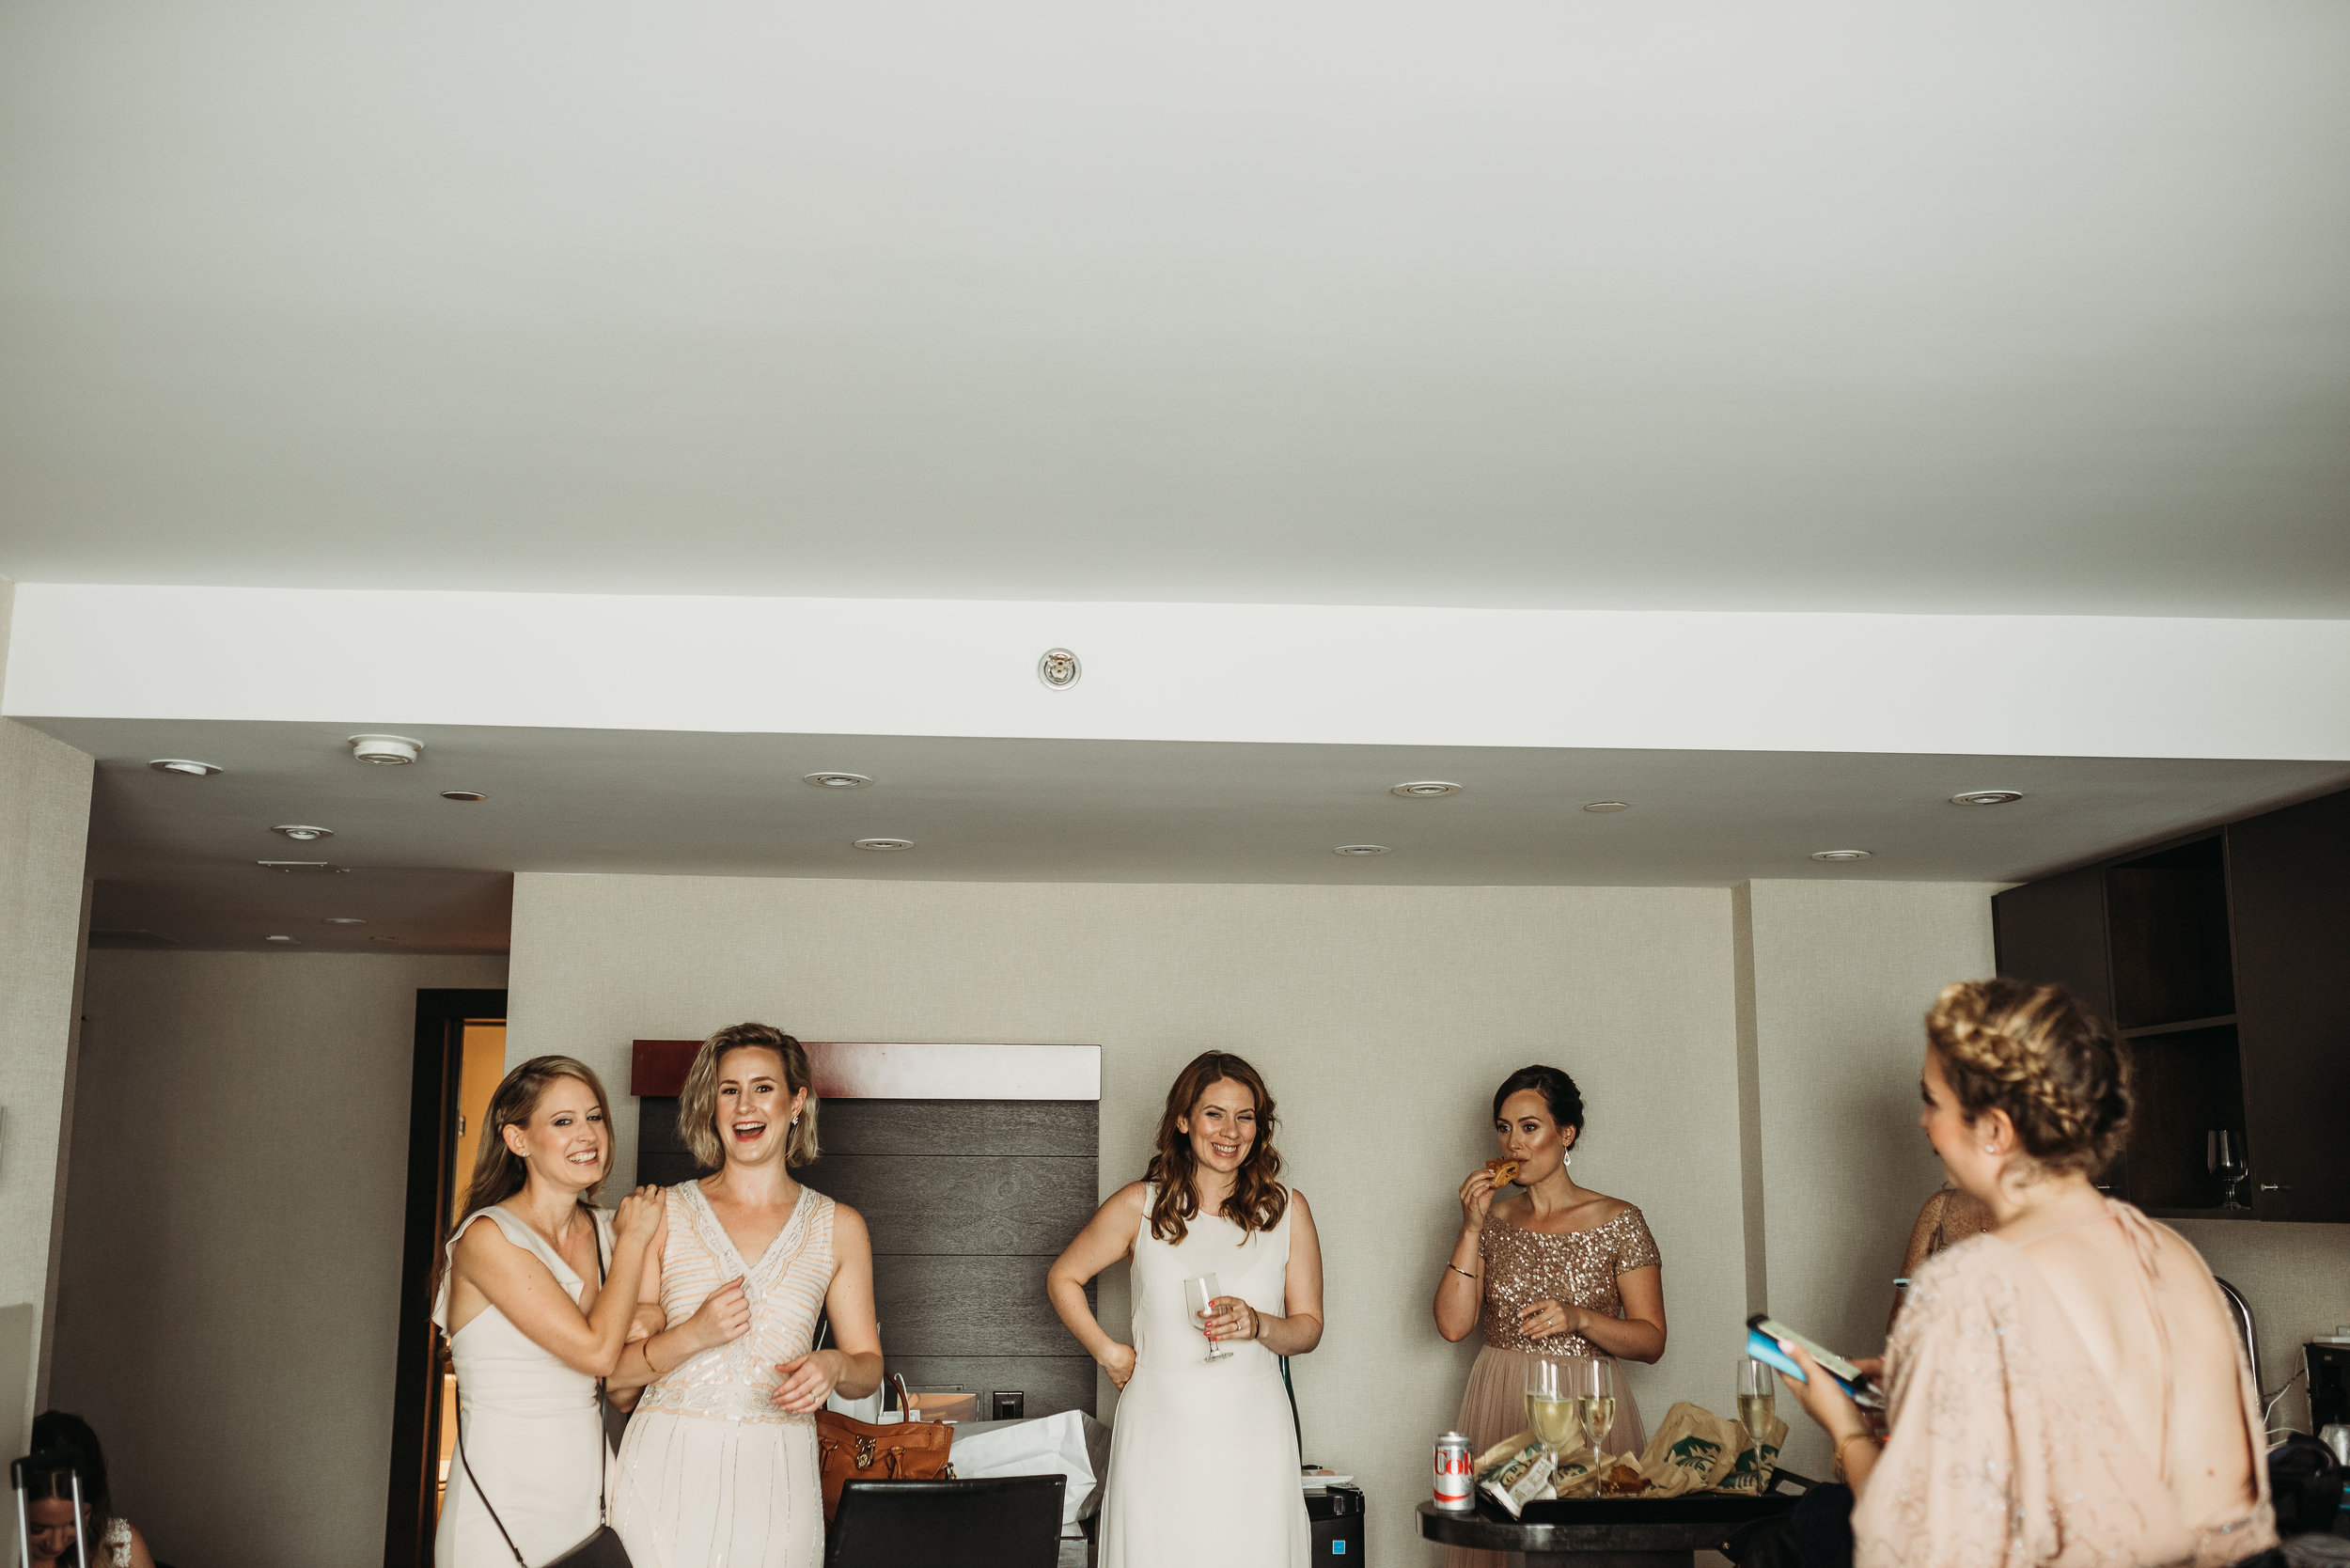 bridal-party-getting-ready-photos-toronto-rustic-boho-airship37-wedding-by-willow-birch-photo-toronto-documentary-wedding-photographers.jpg